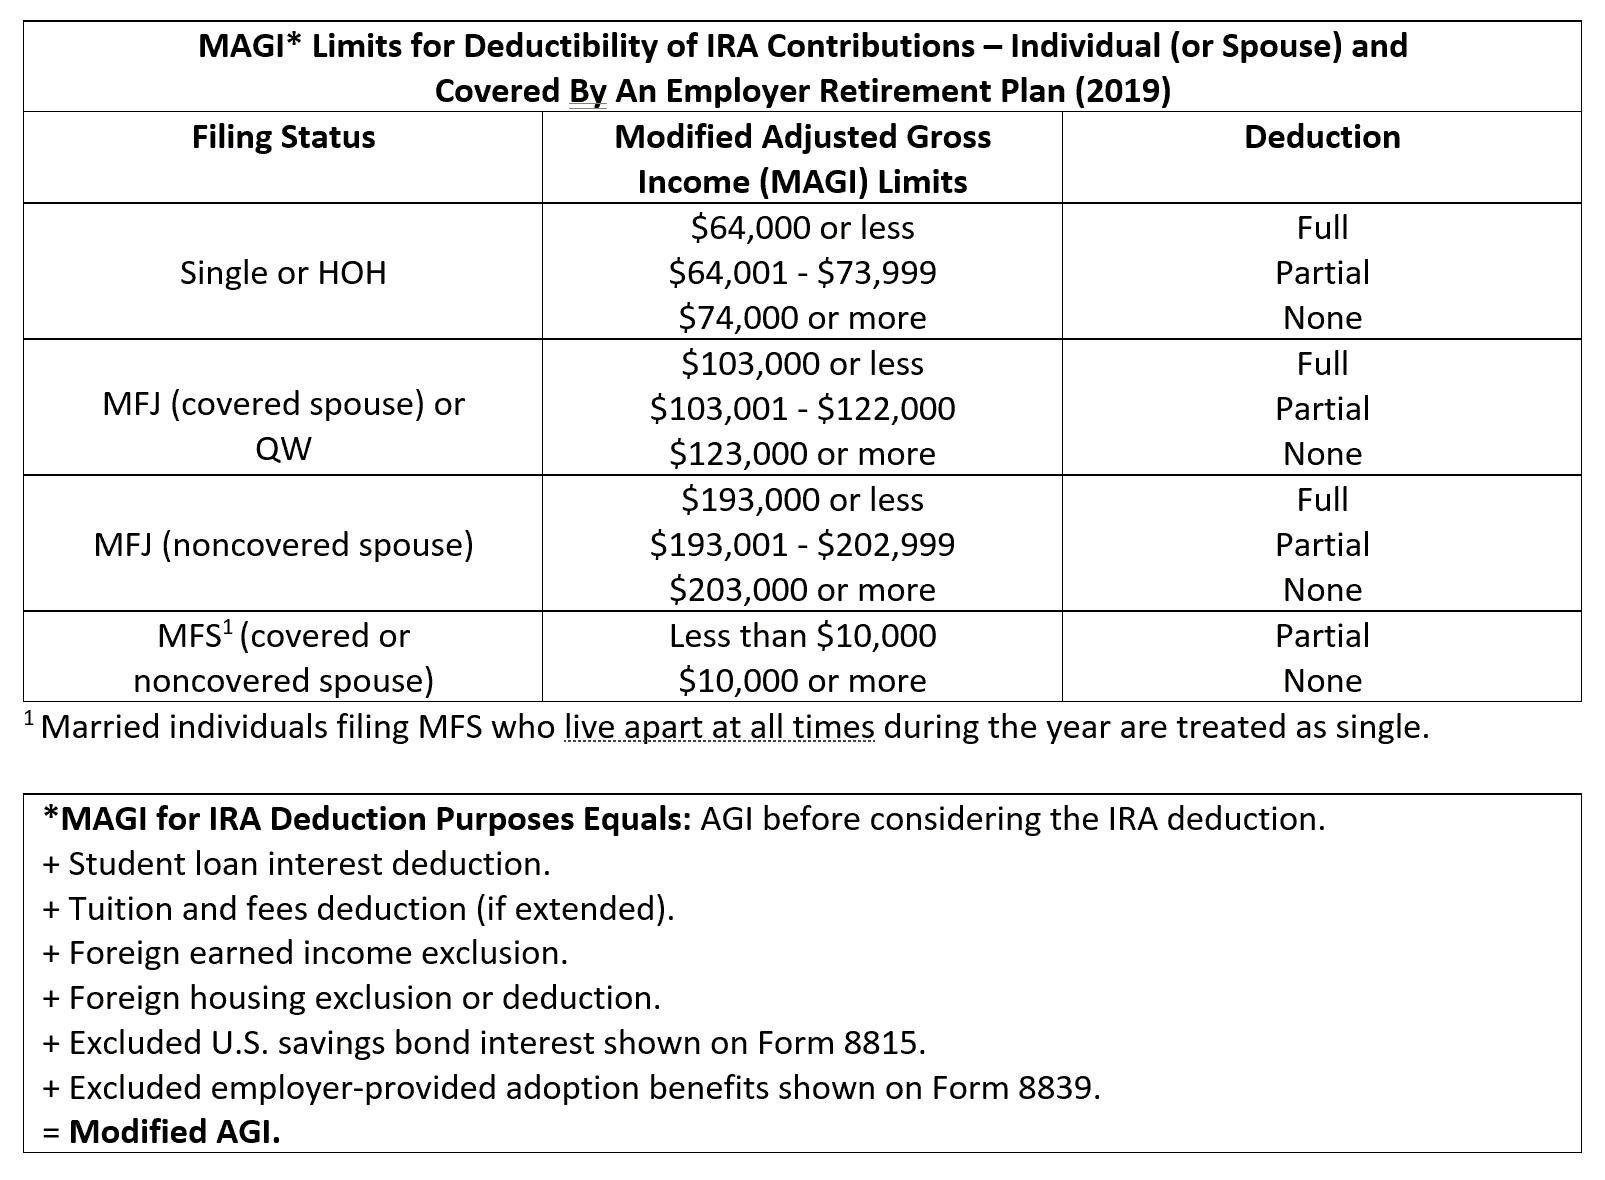 ira donation rules revenue limits